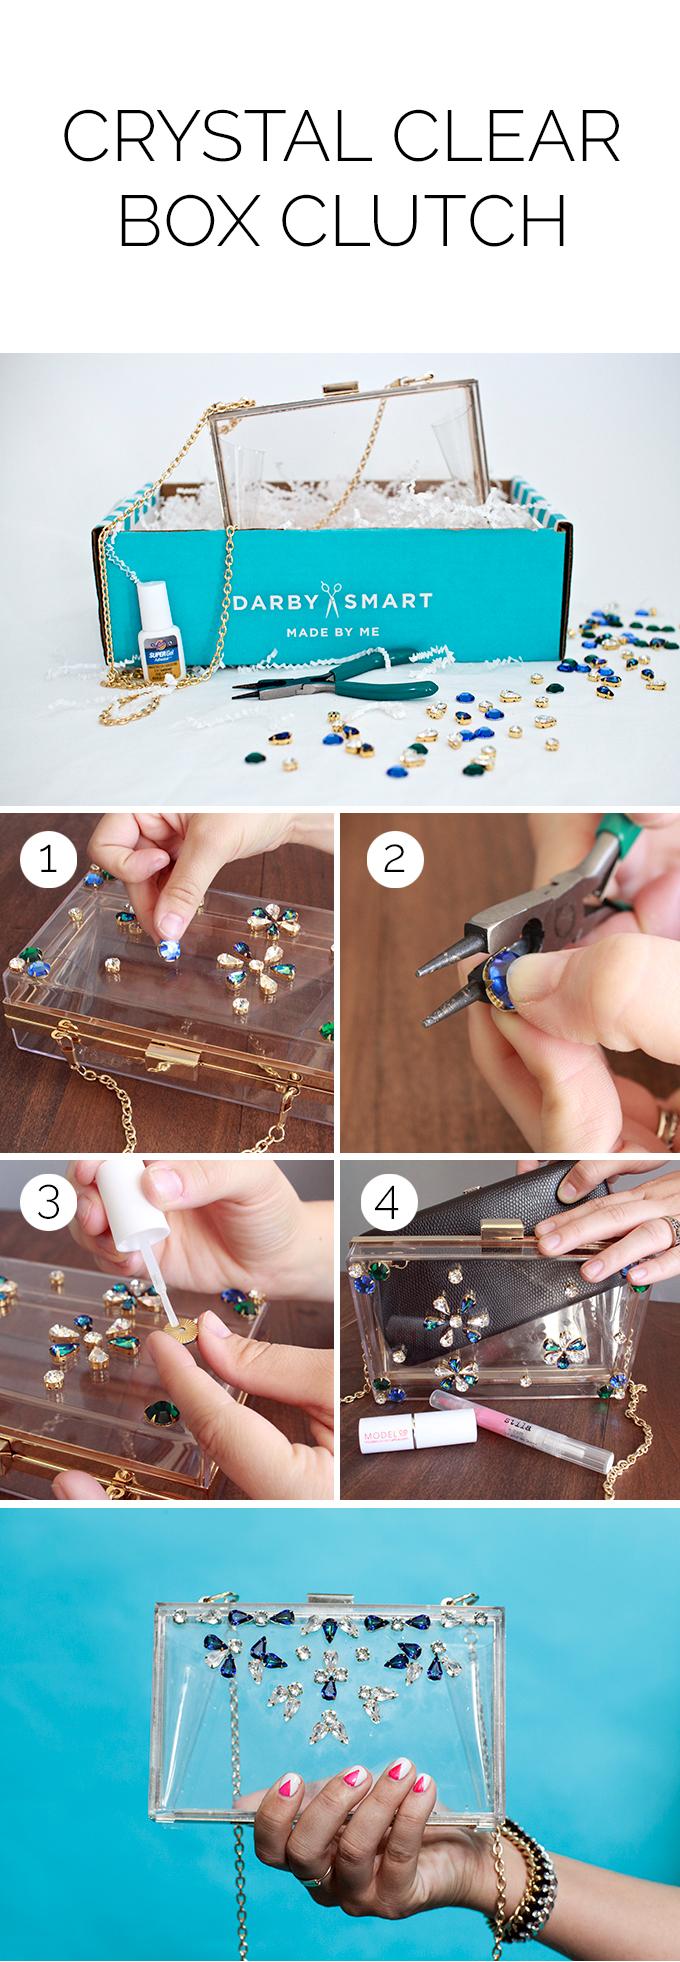 Crystal Clear Box Clutch Kit